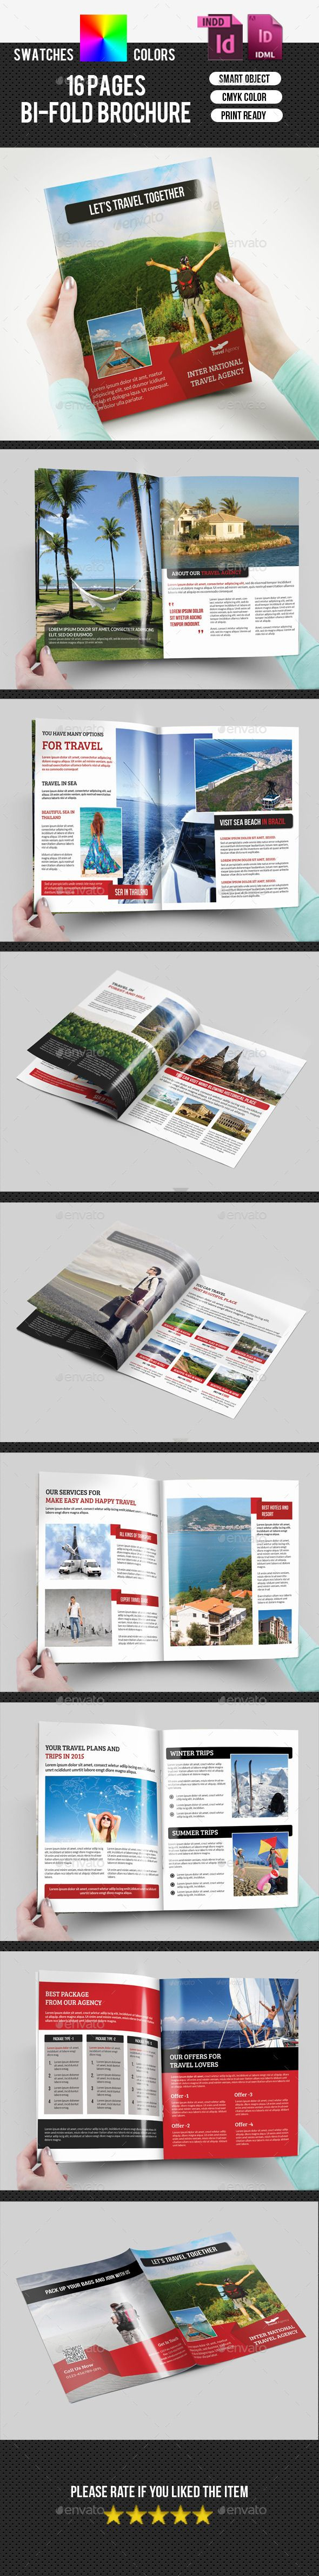 Travel Agency Bifold Brochure-V166